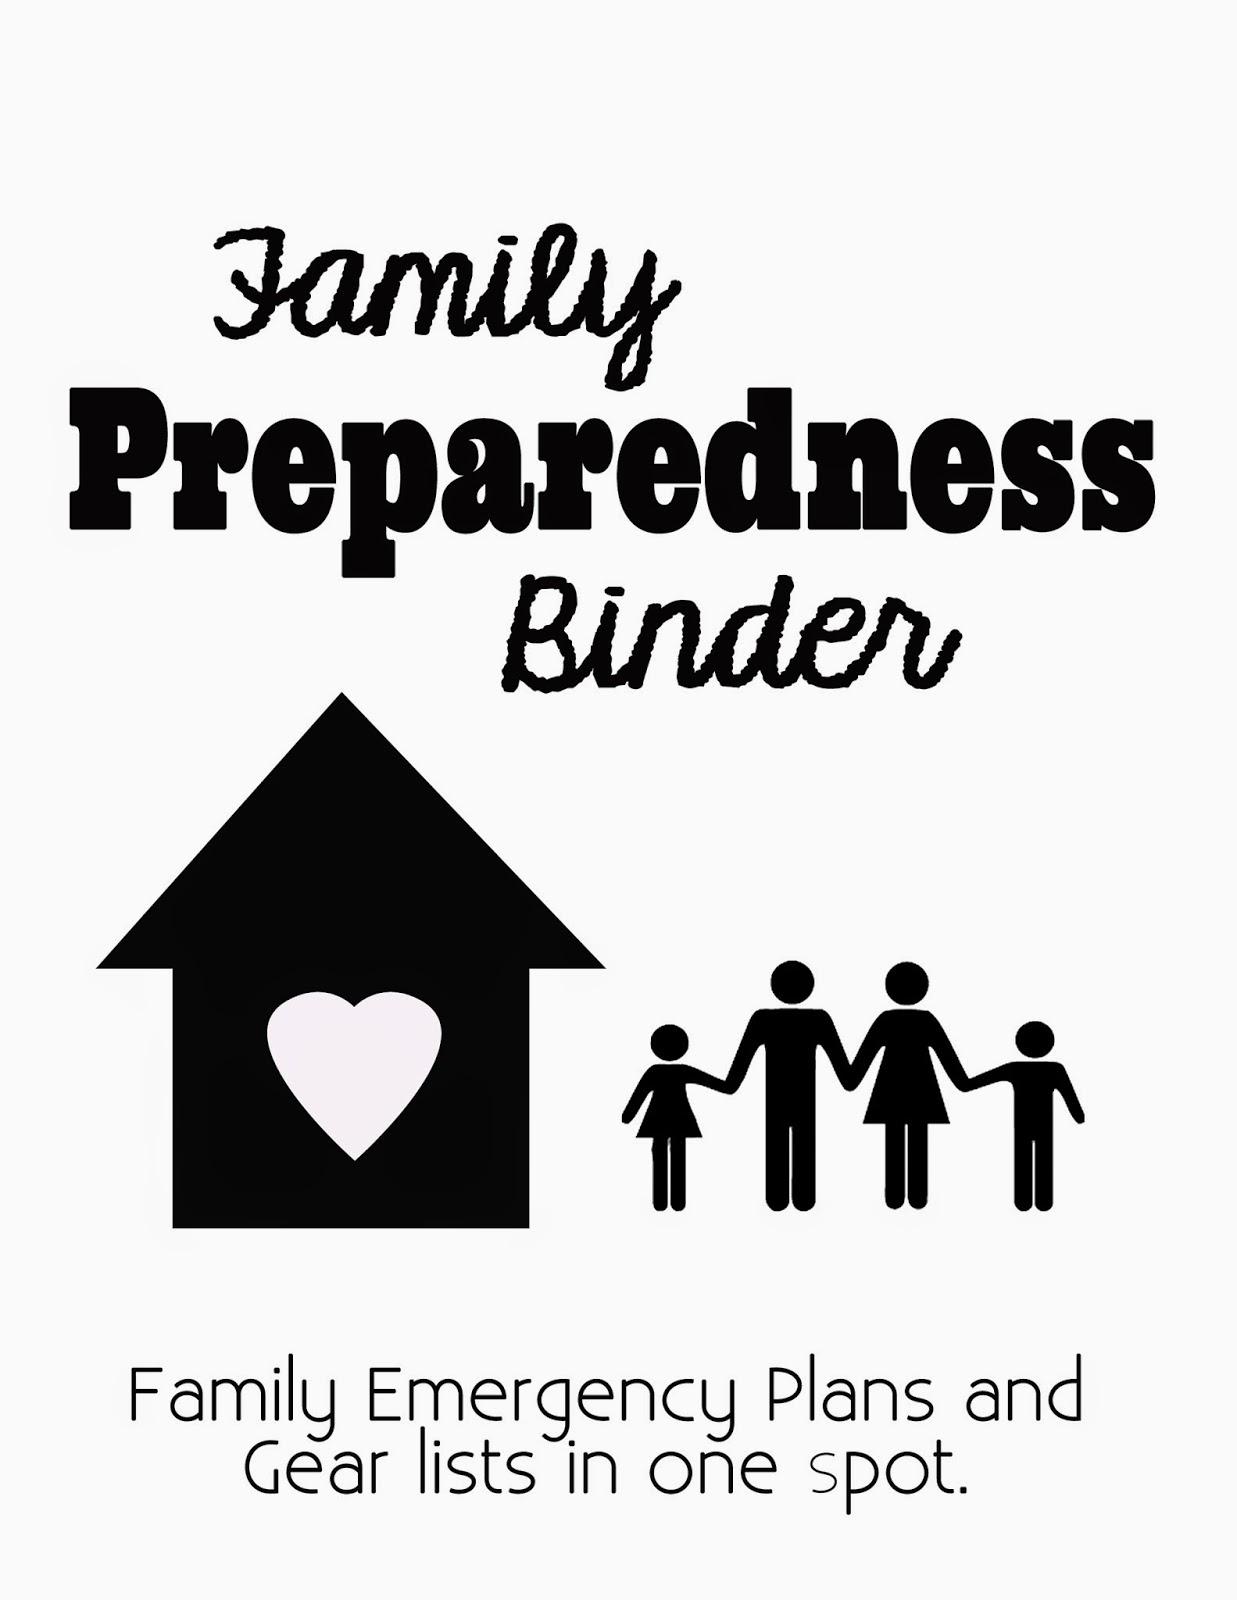 Family Preparedness Binder Information